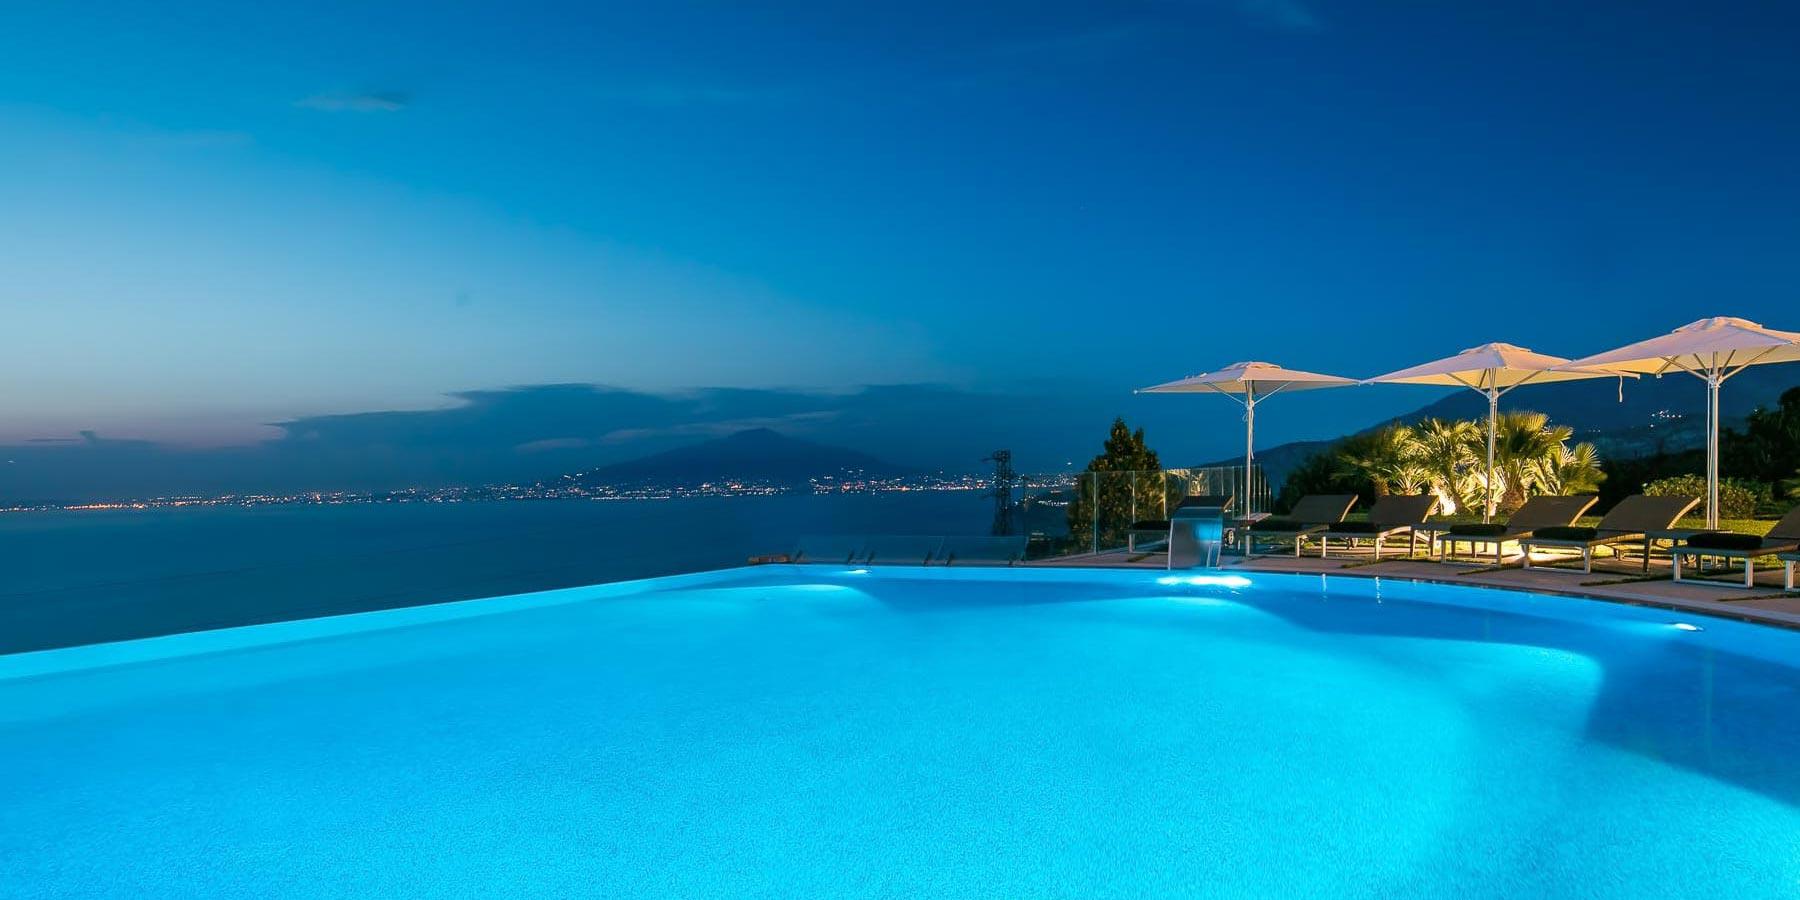 Grand Hotel Due Golfi  Hotel panoramico a Sorrento con piscina  Capodanno a Sorrento